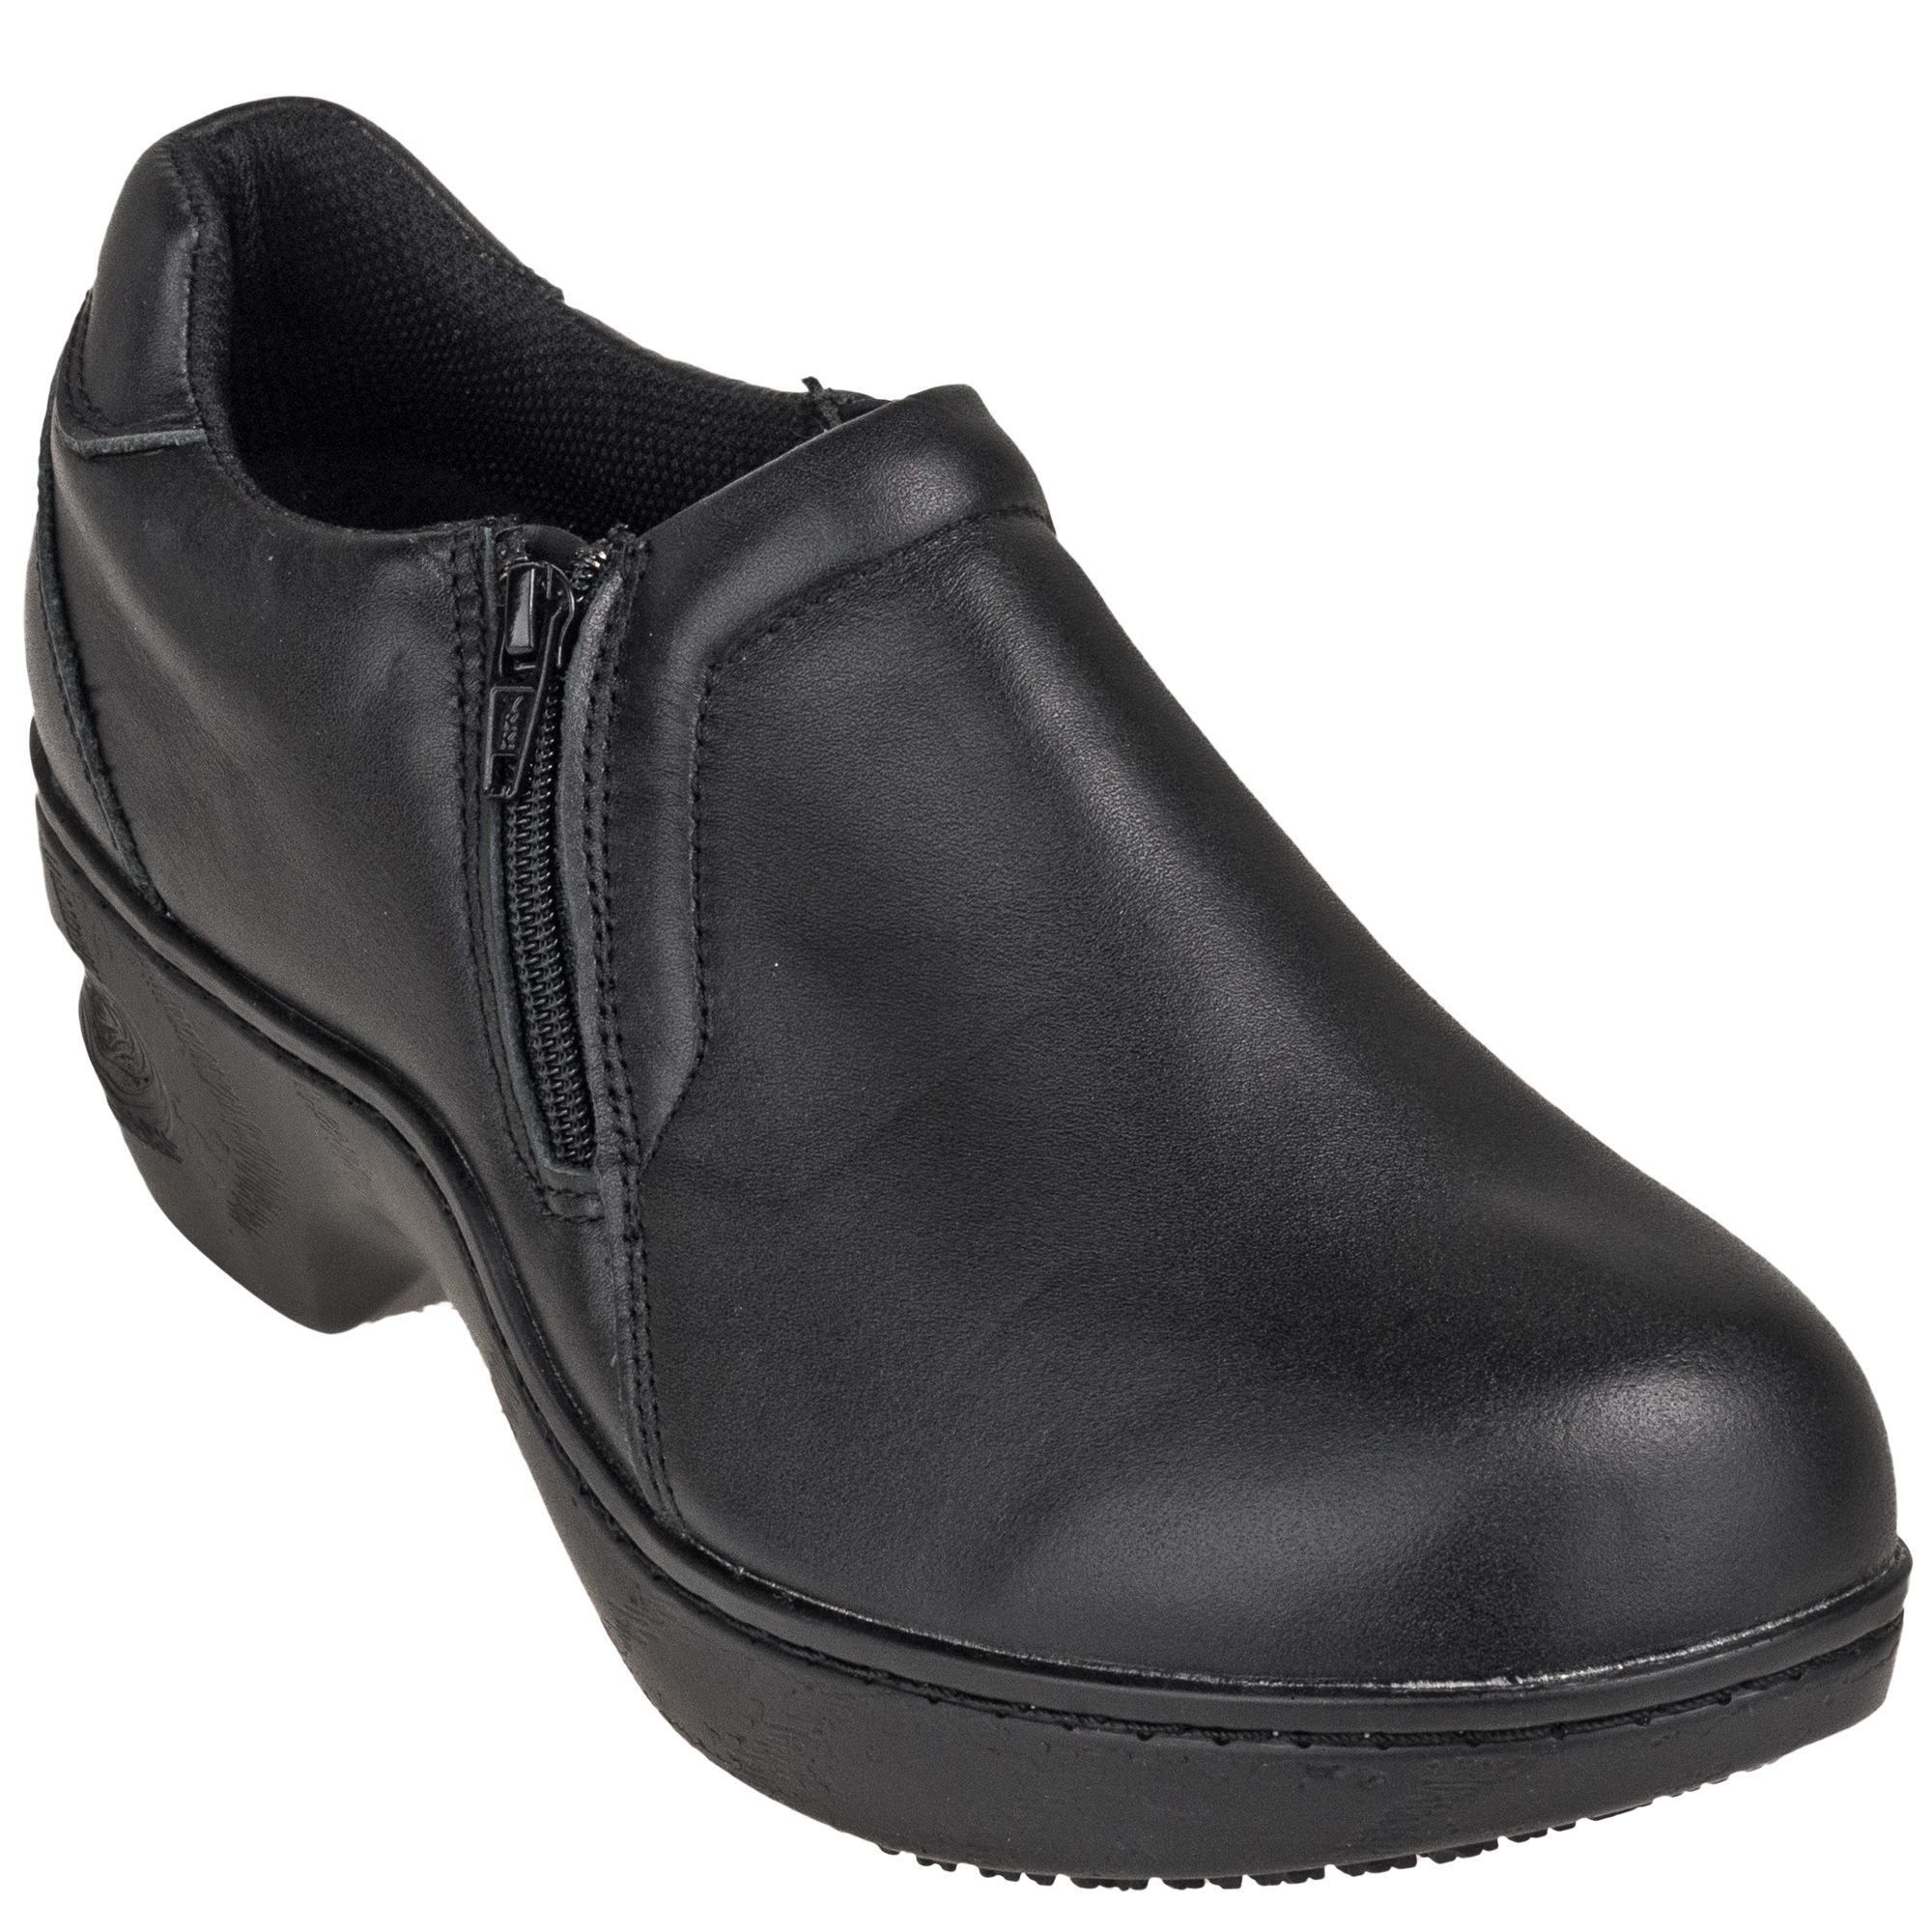 406966a4ffe5 Genuine Grip Women s 460 Black Slip-Resistant Slip-On Side Zip Shoes ...